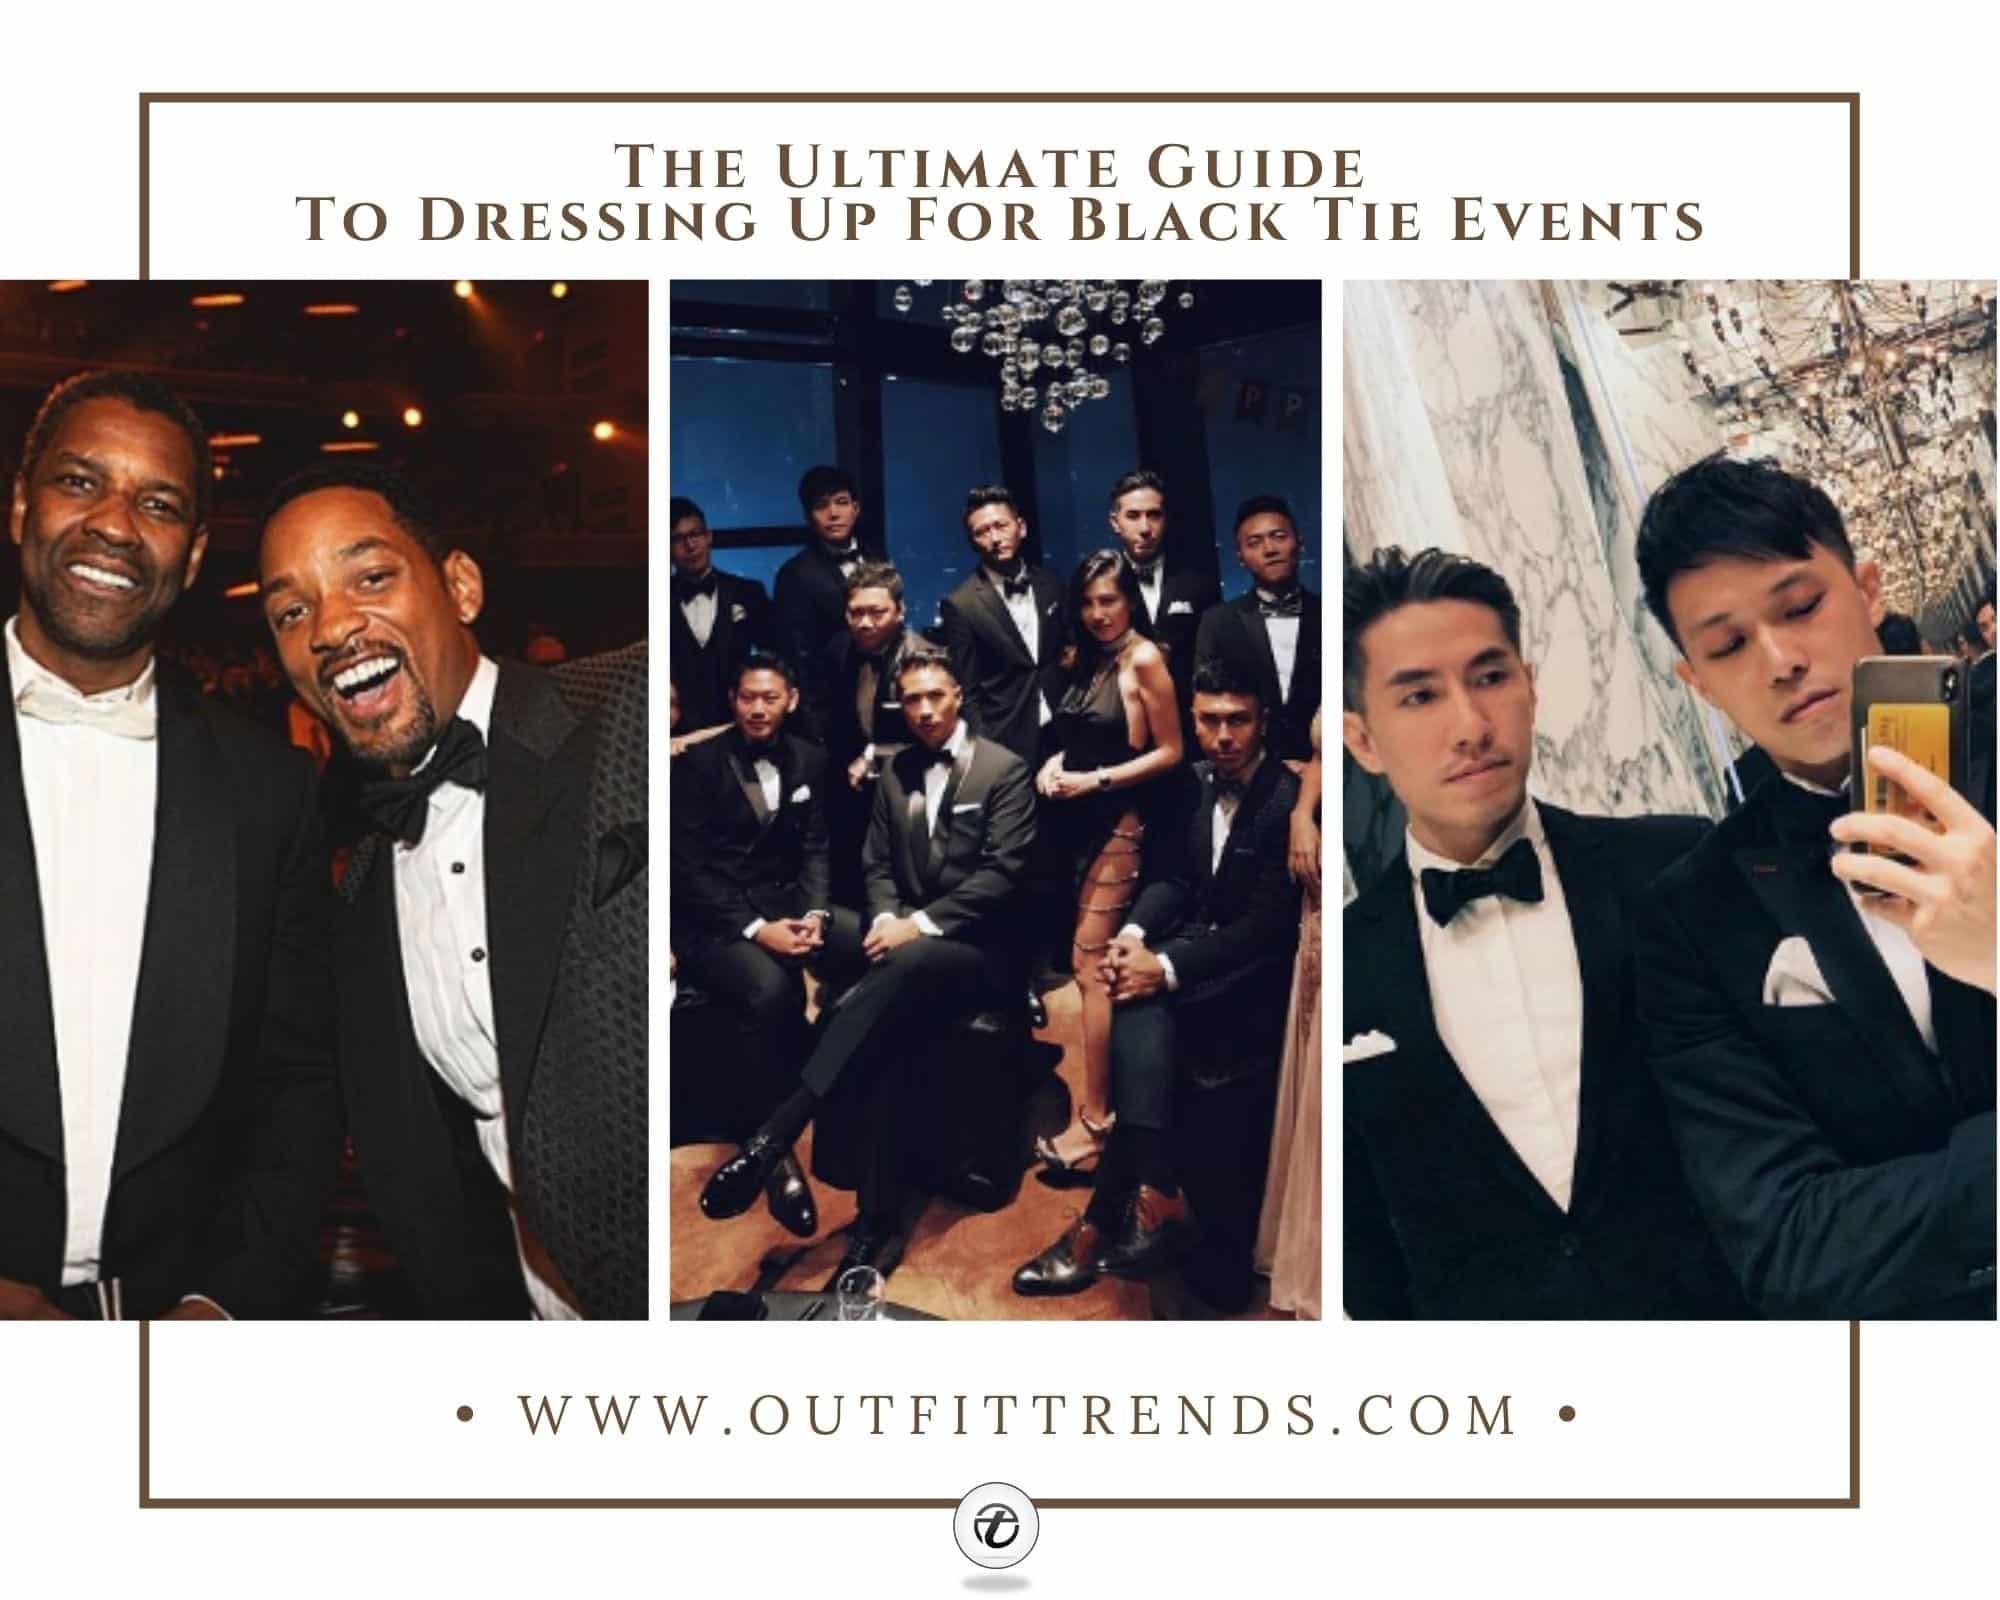 Men's Black Tie Dress Code | 17 Outfits for Black Tie Events